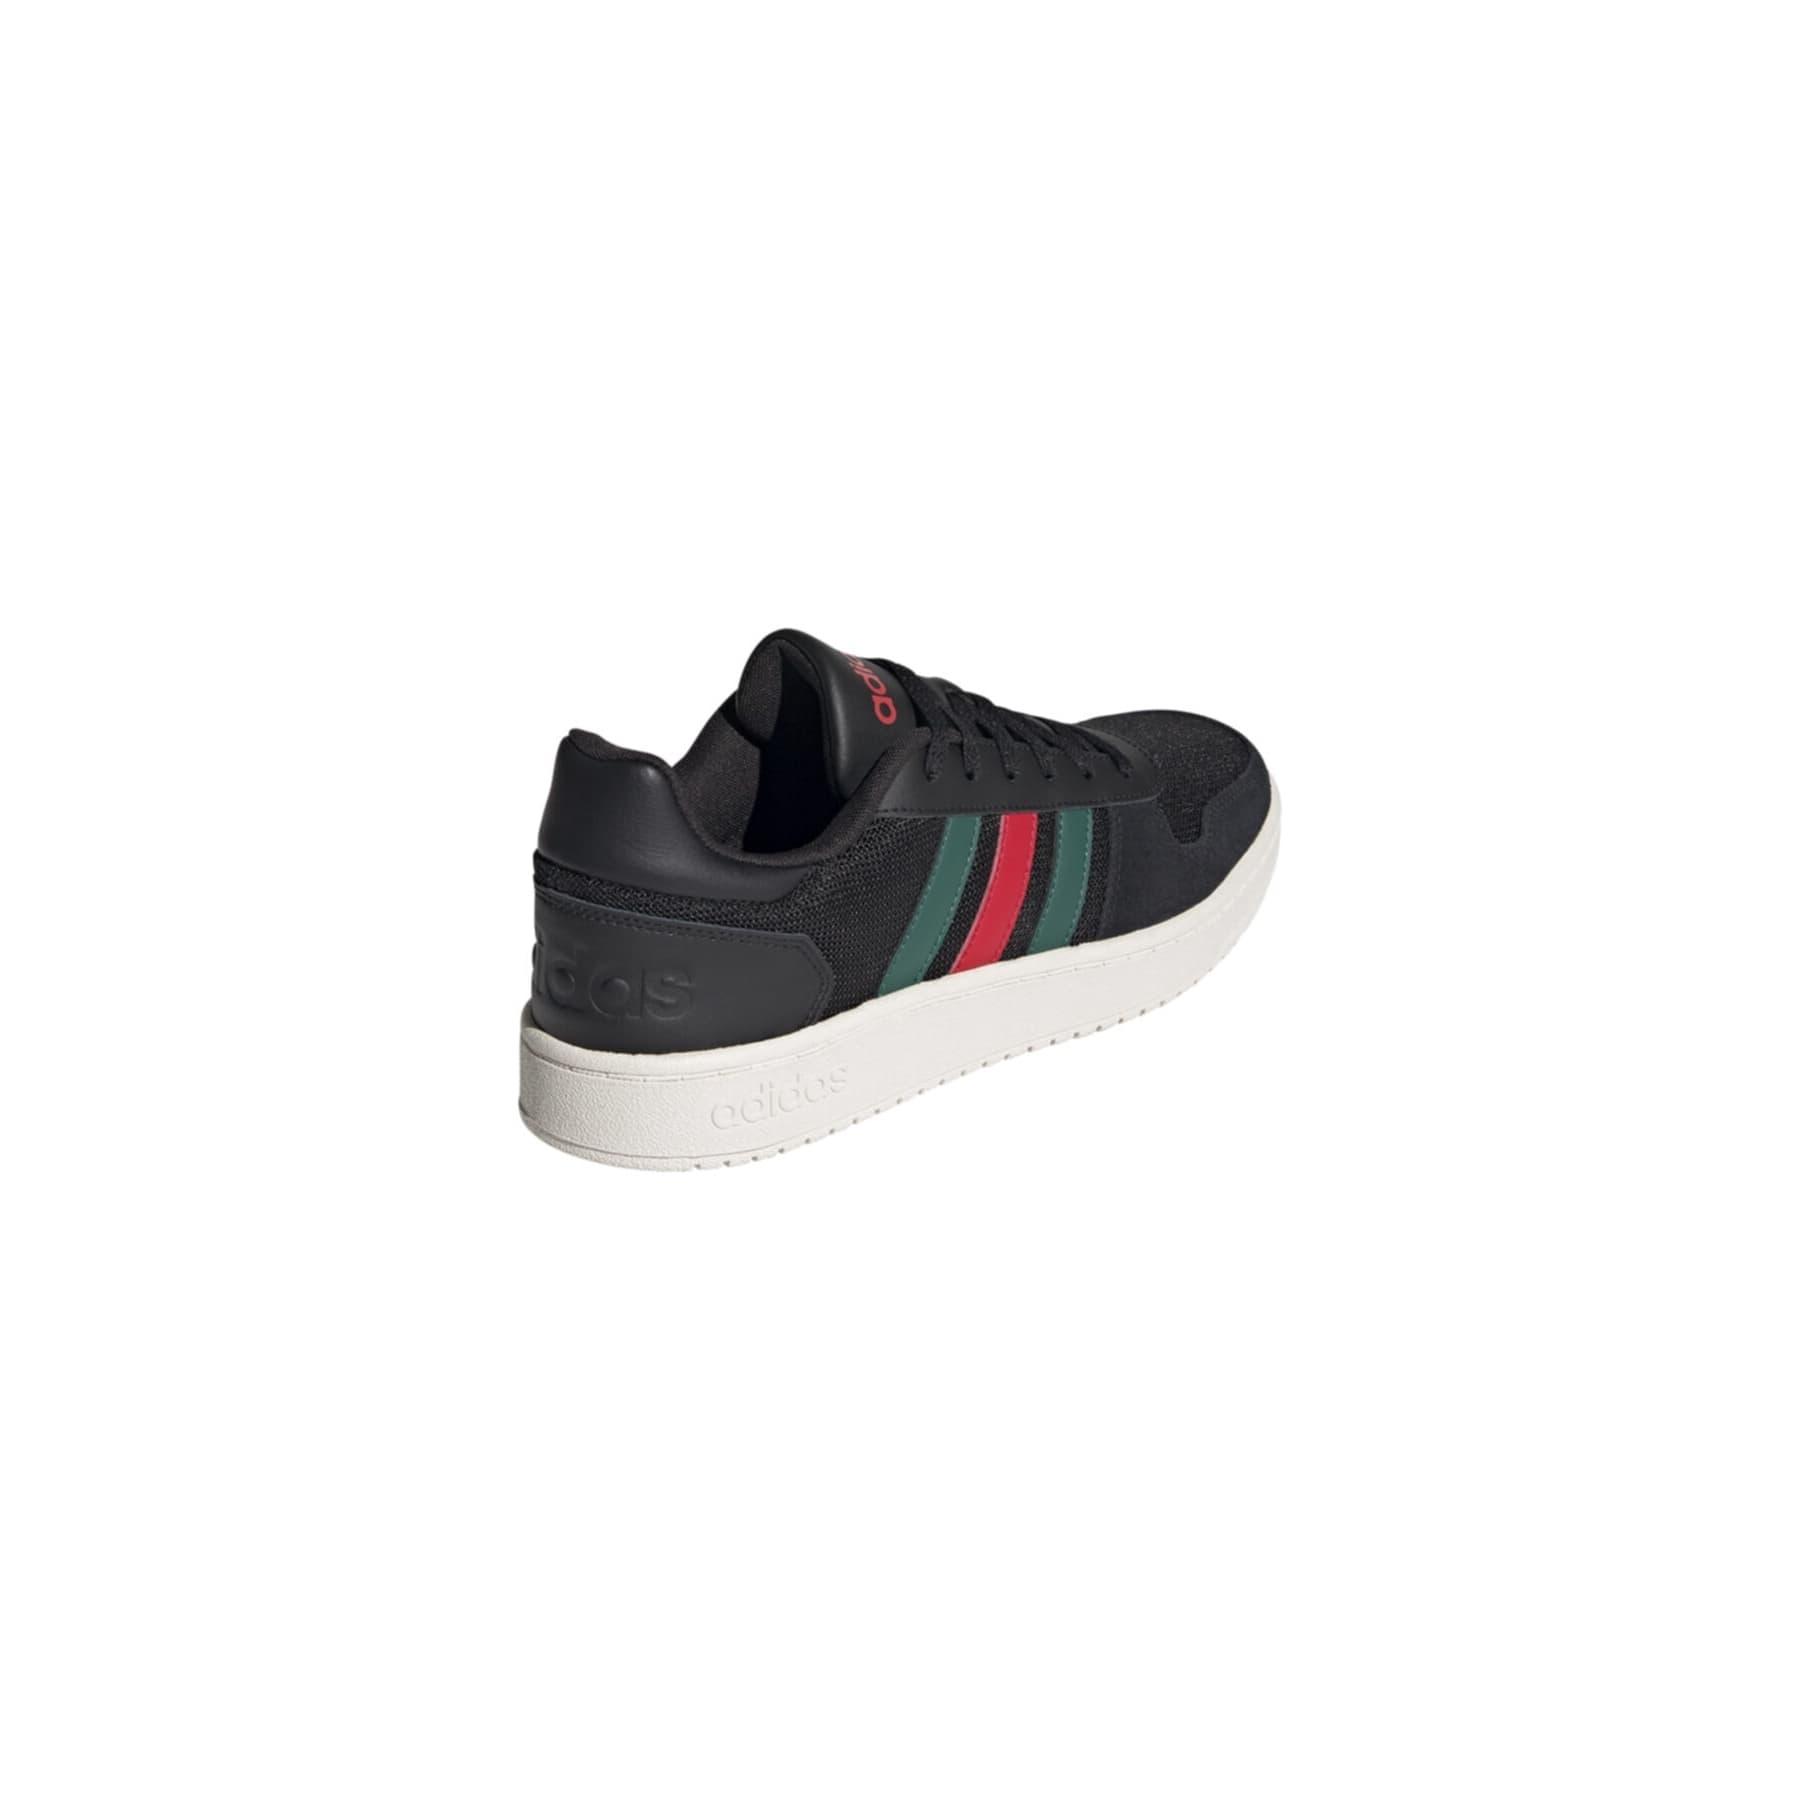 Hoops 2.0 Erkek Siyah Spor Ayakkabı (FY5208)